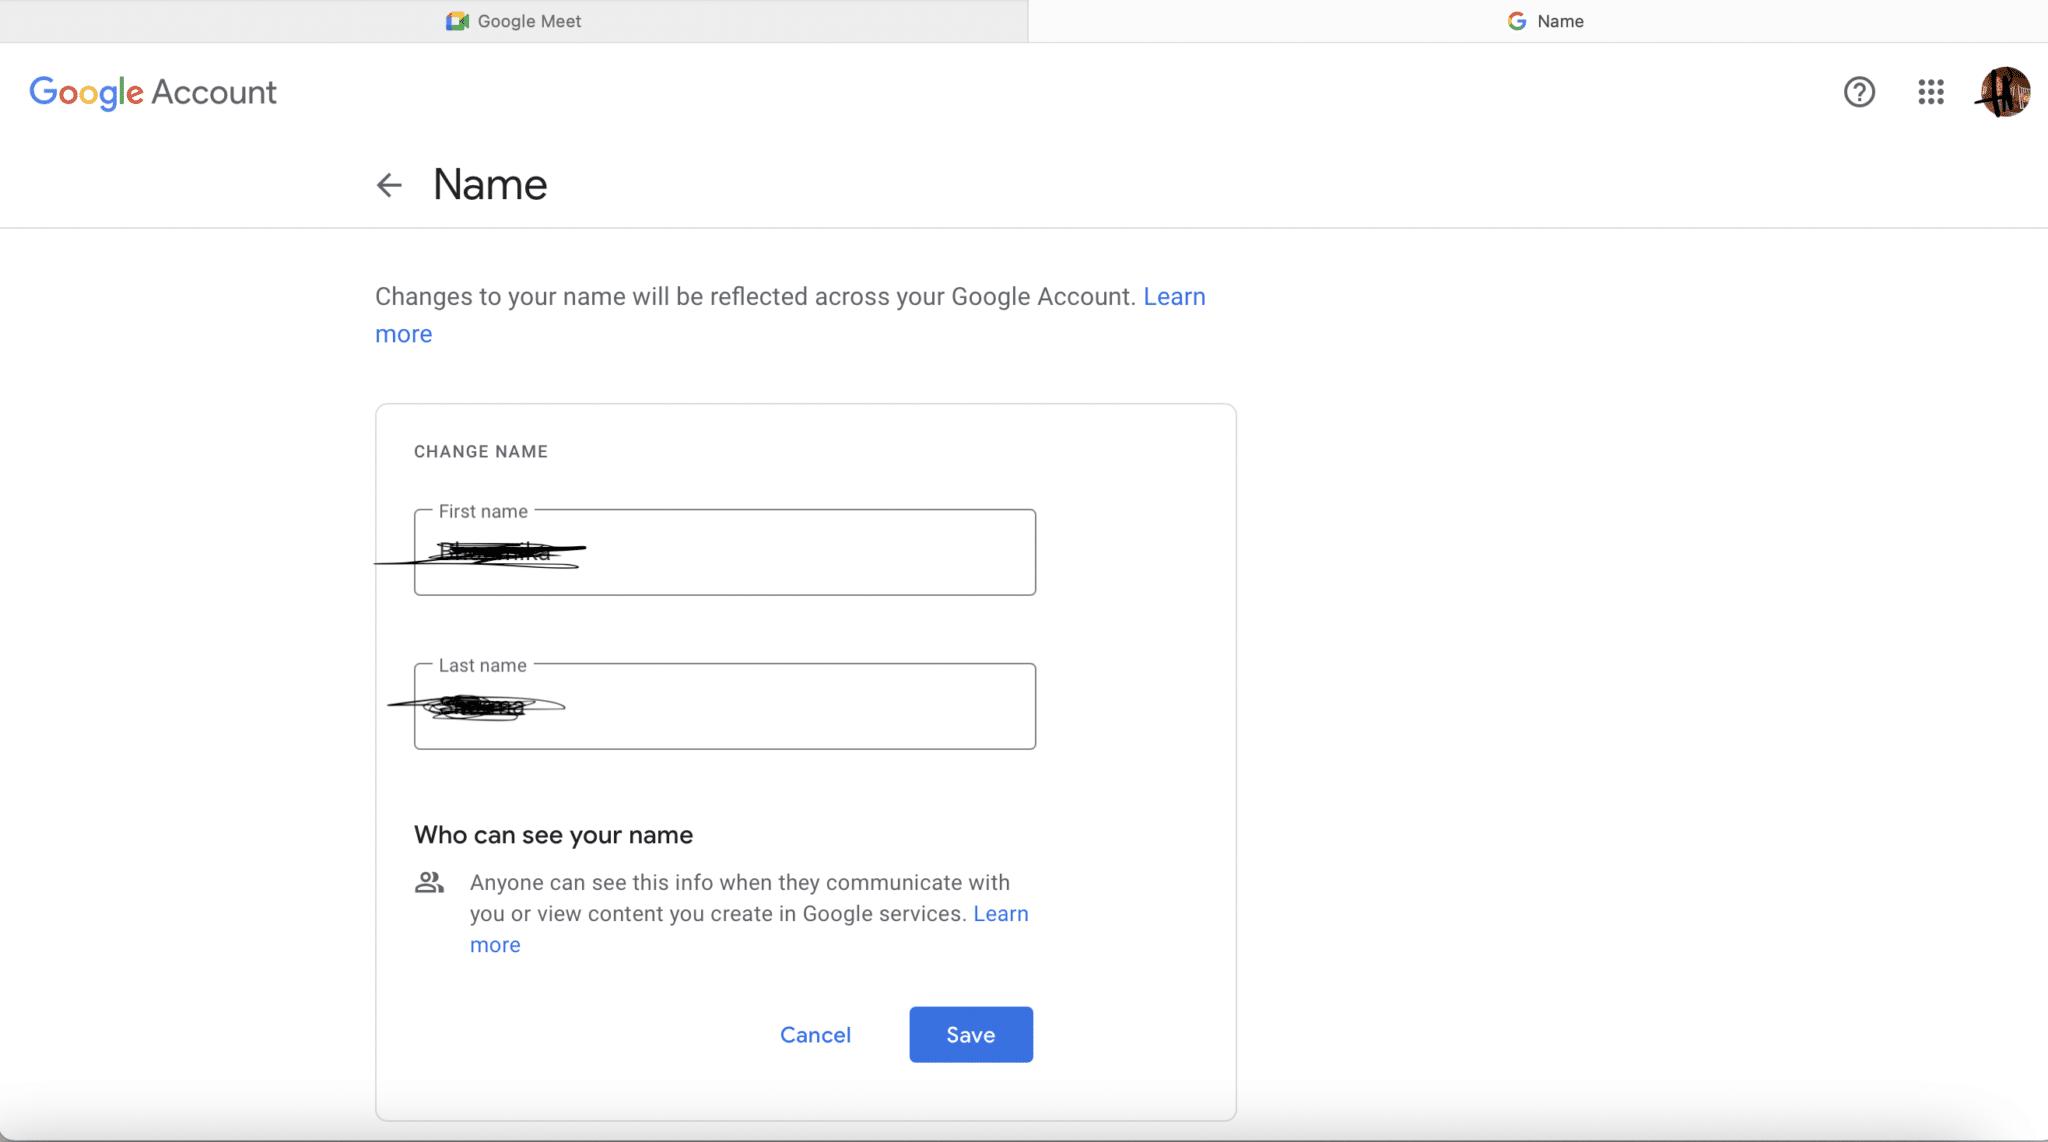 Click on Save. Google Meet Display Name